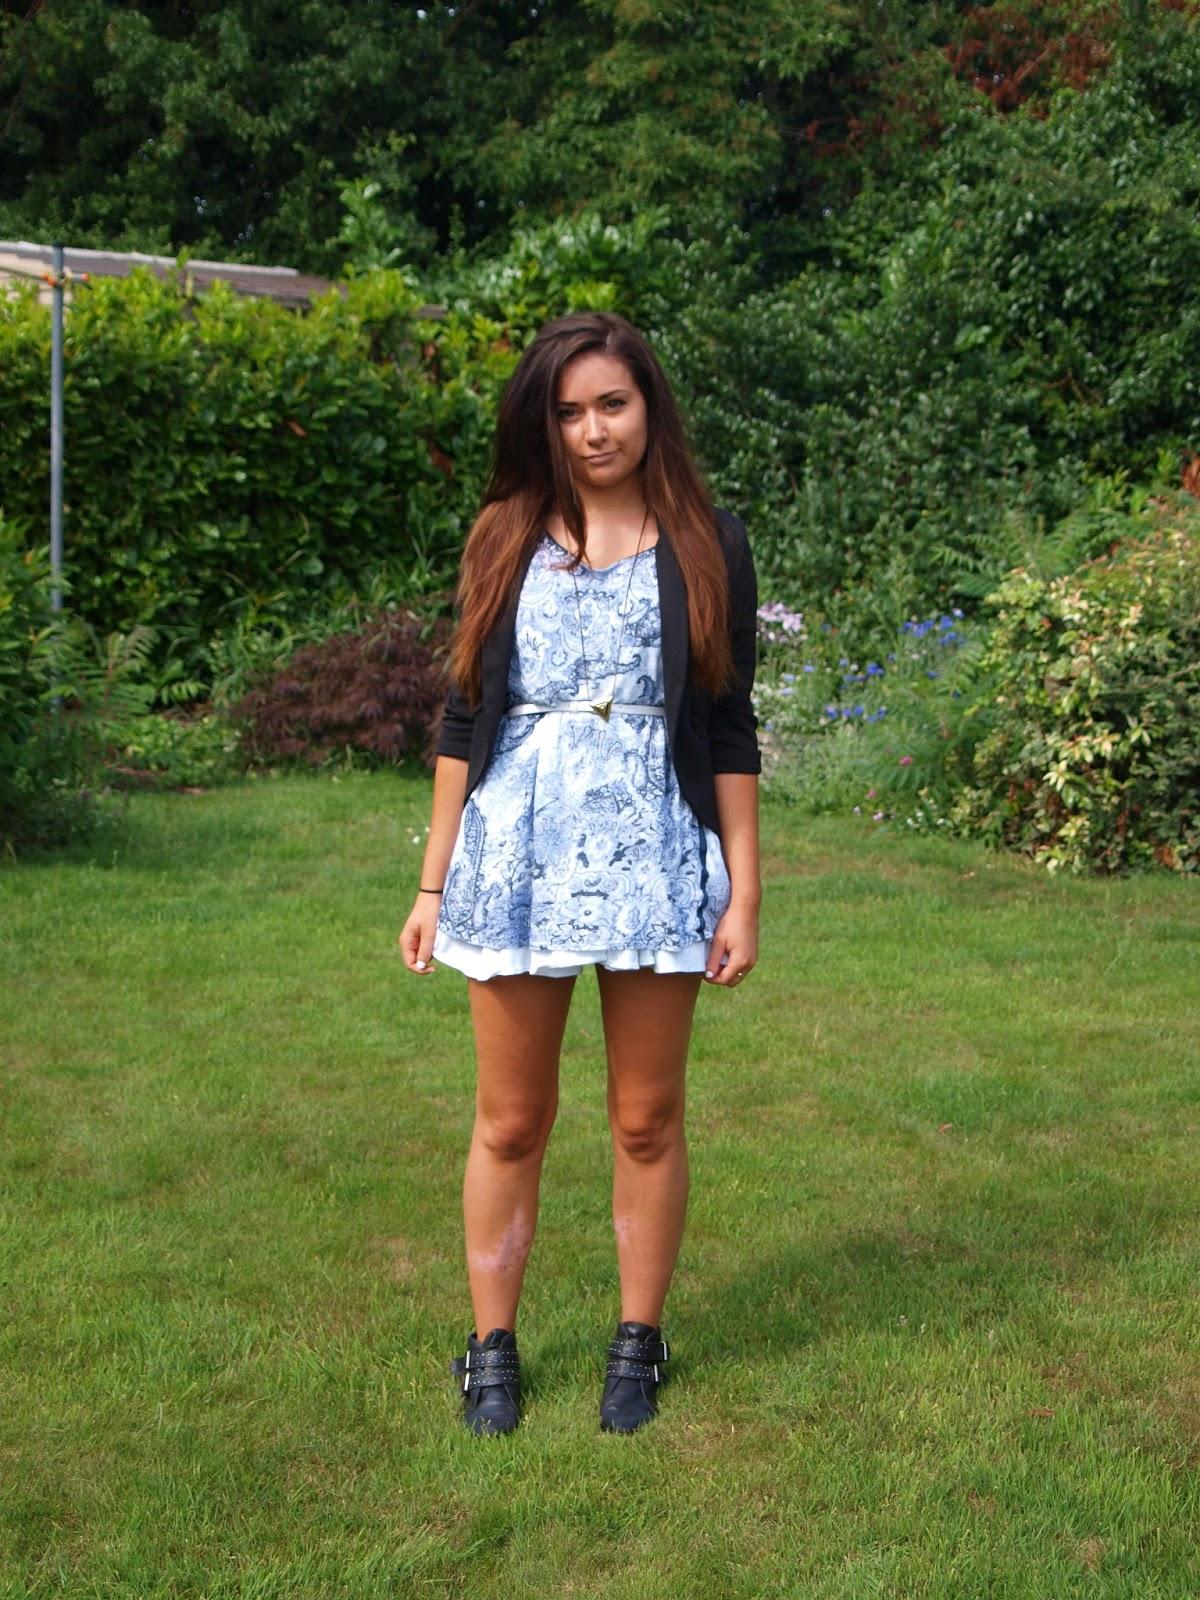 Marzia Bisognin Ombre T-shirt dress - zara (old)